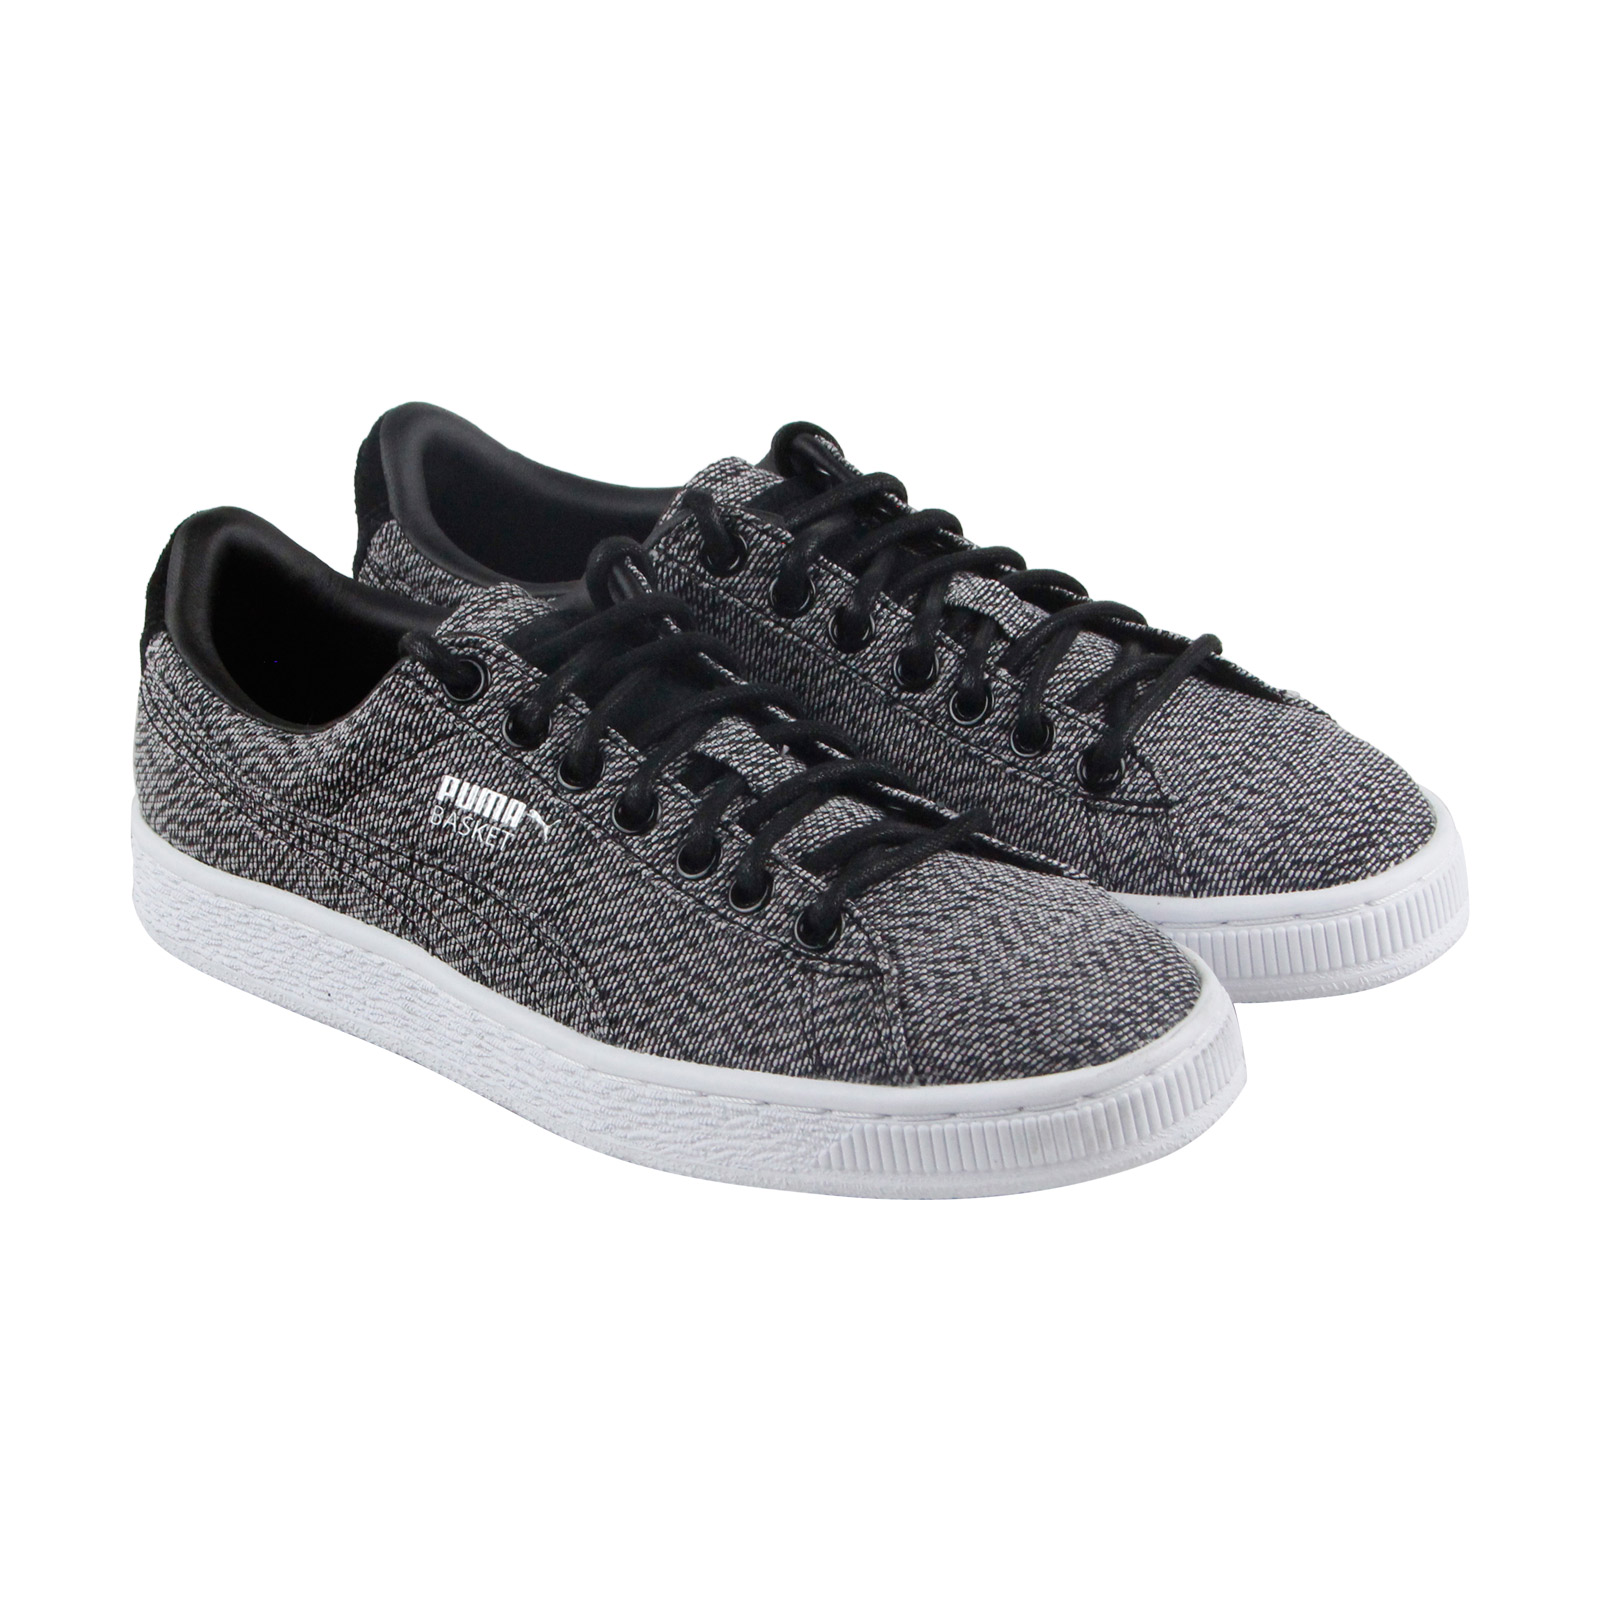 79b2007b484a Puma Basket Classic Culture Surf Mens Gray Textile Sneakers Shoes ...